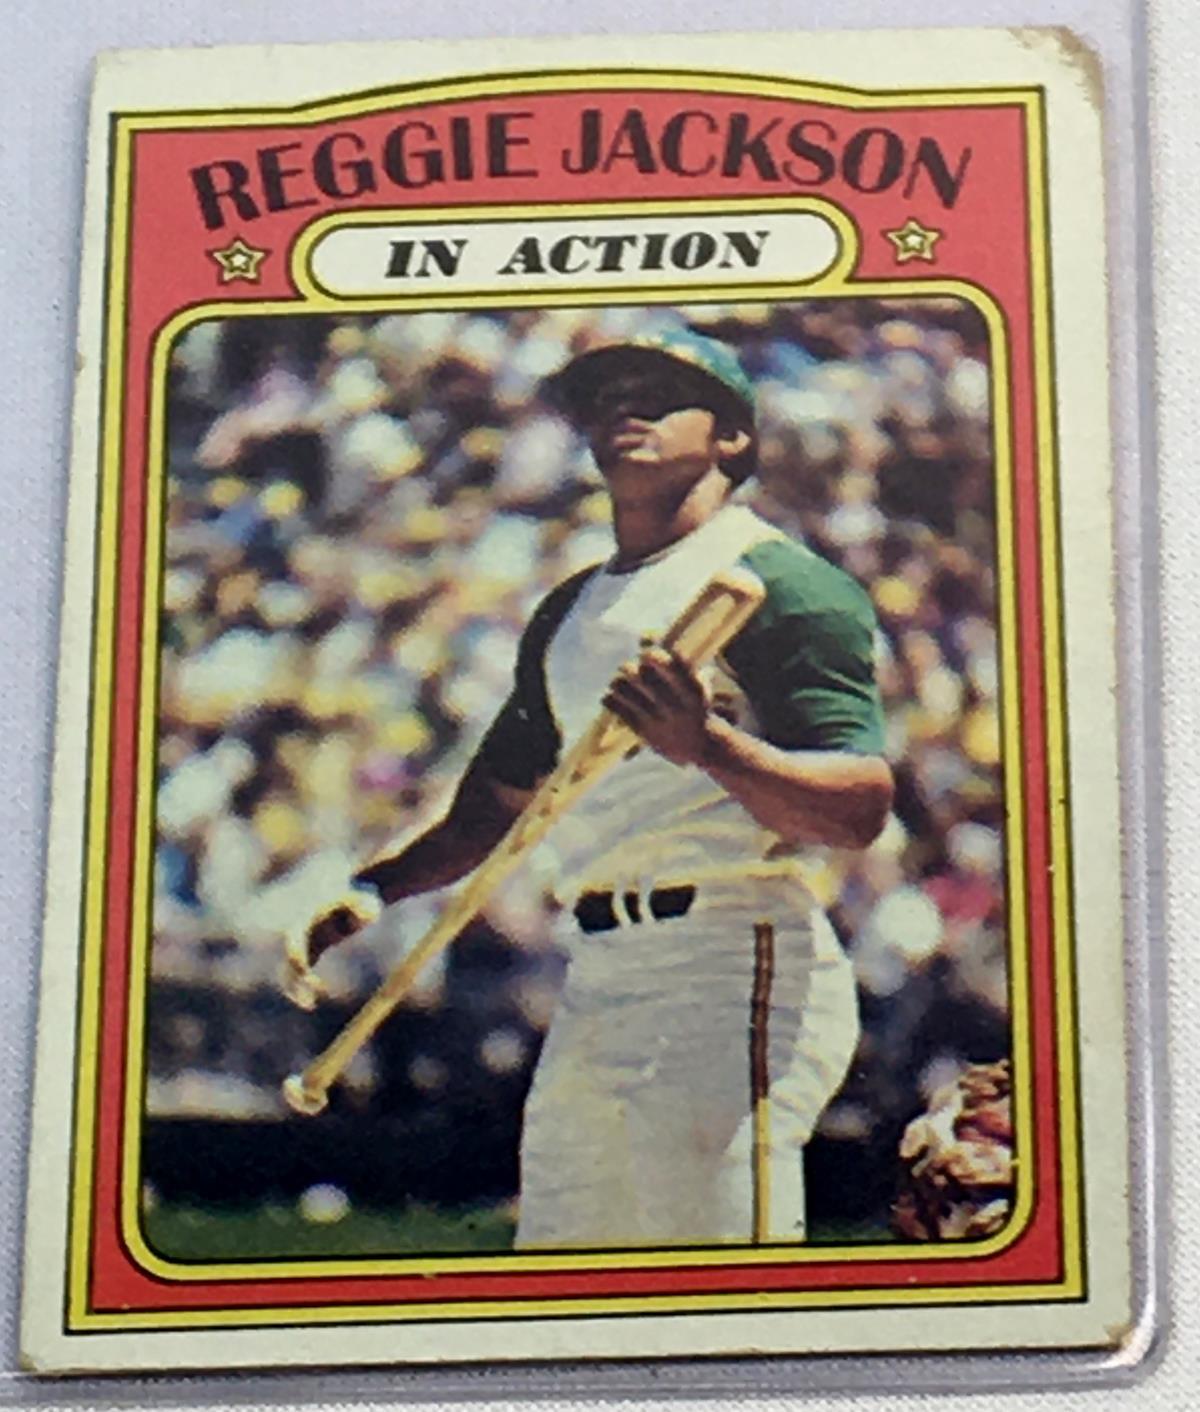 1972 Topps Set Break #436 Reggie Jackson IA Baseball Card